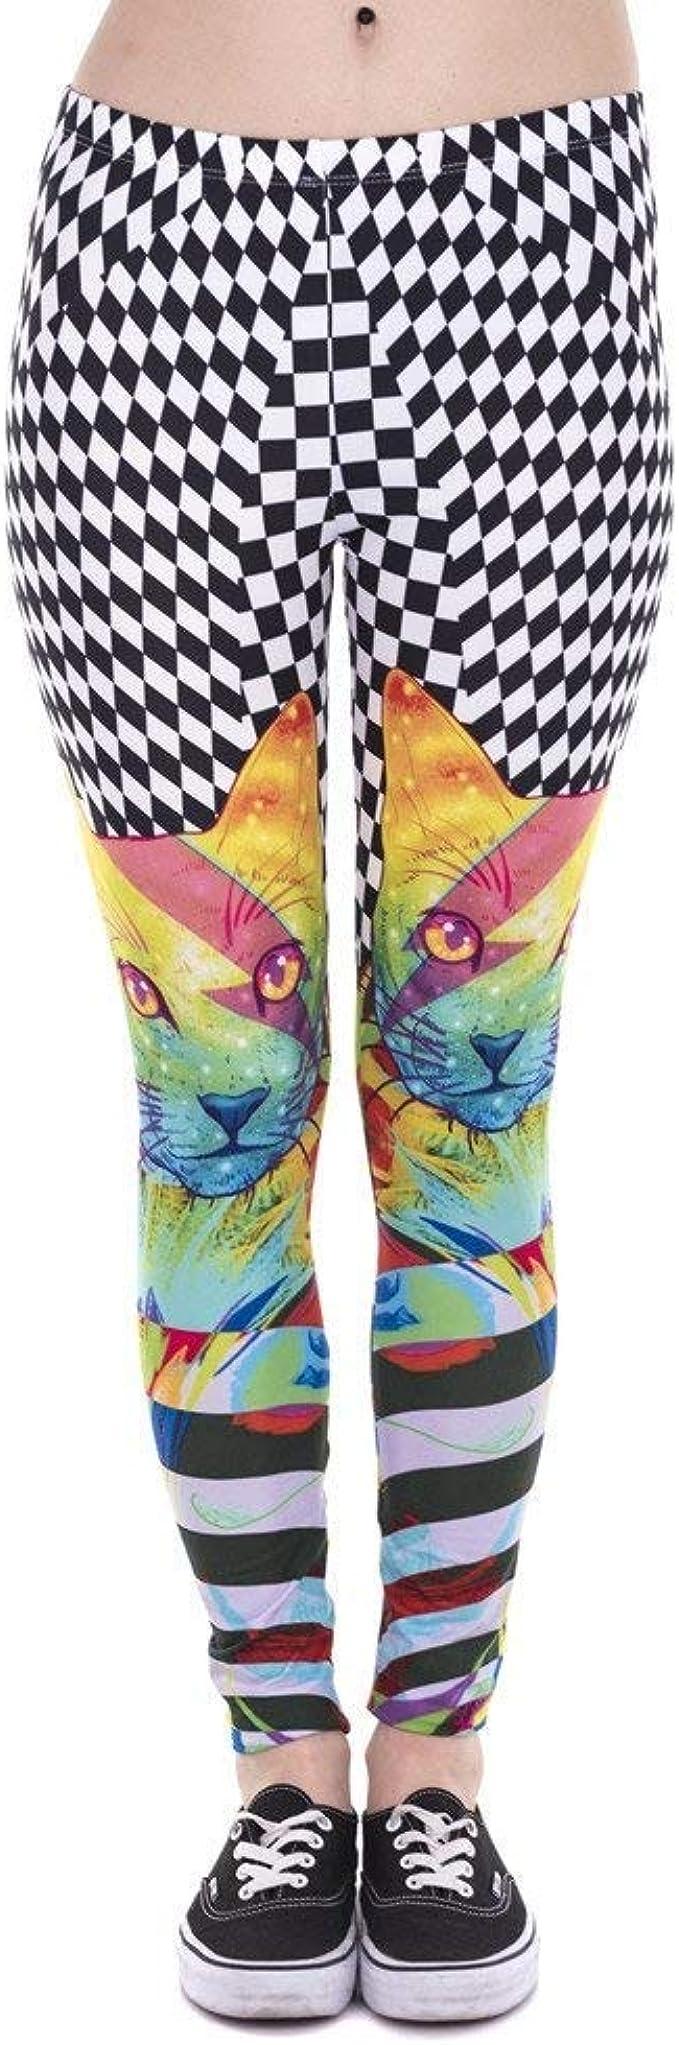 Pantalones De Yoga Moda Mujer Leggings Colorido Gato Ropa Hipnótico Impreso Leggins Fitness Legging Pantalones De Mujer De Cintura Alta (Color : Lga43854, Size : One Size): Amazon.es: Ropa y accesorios